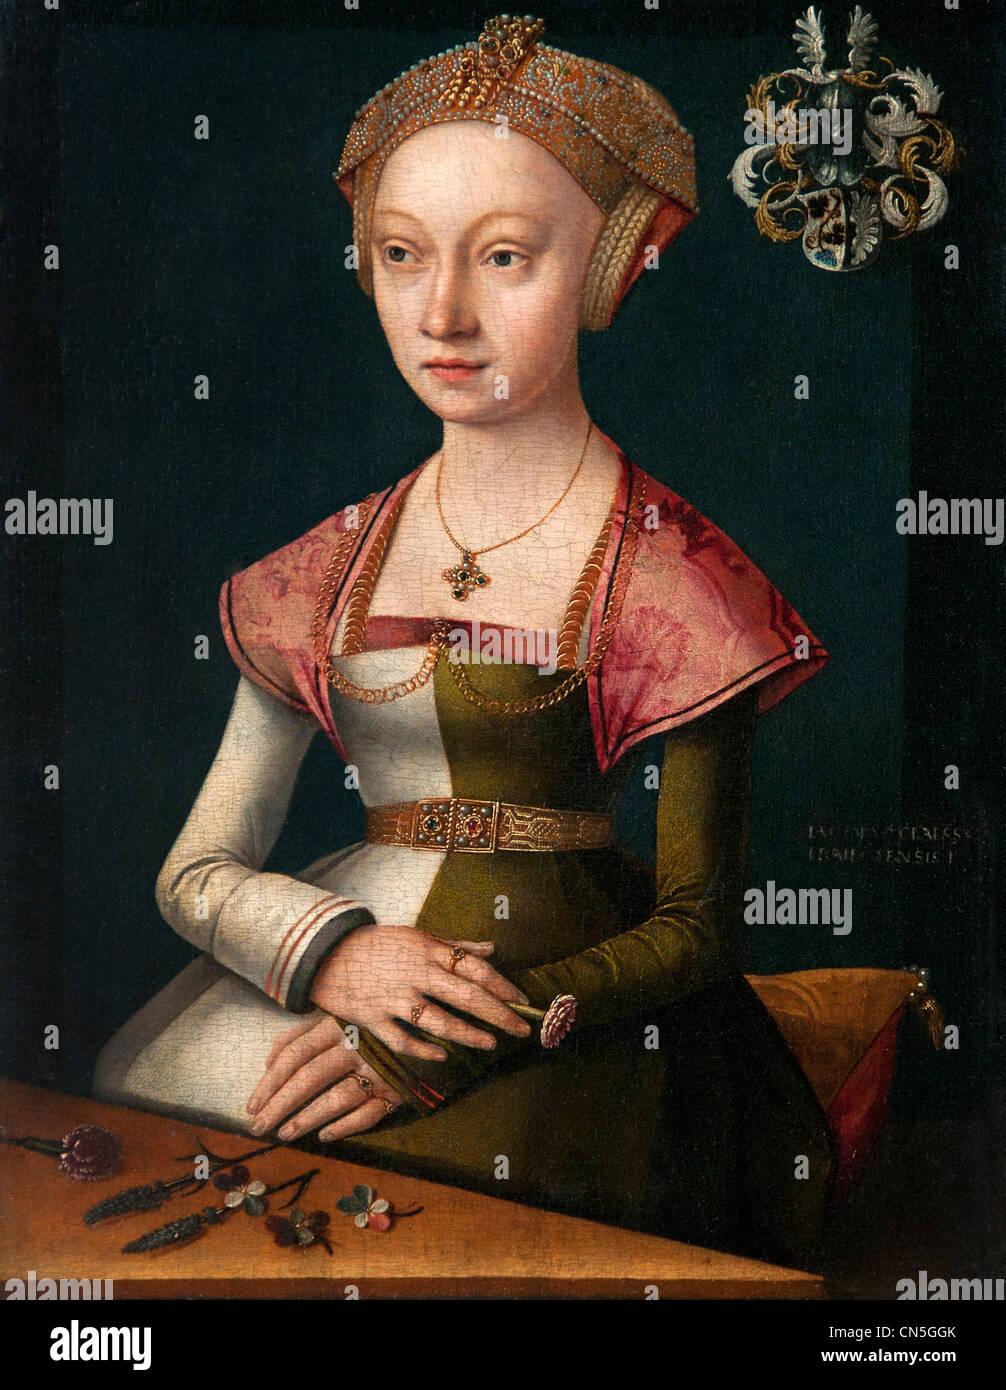 Portrait of woman holding a Nut by CLAESZt Jacob Jacob van UTRECHT Utrecht 1506 - 1532 Dutch Belgian - Stock Image